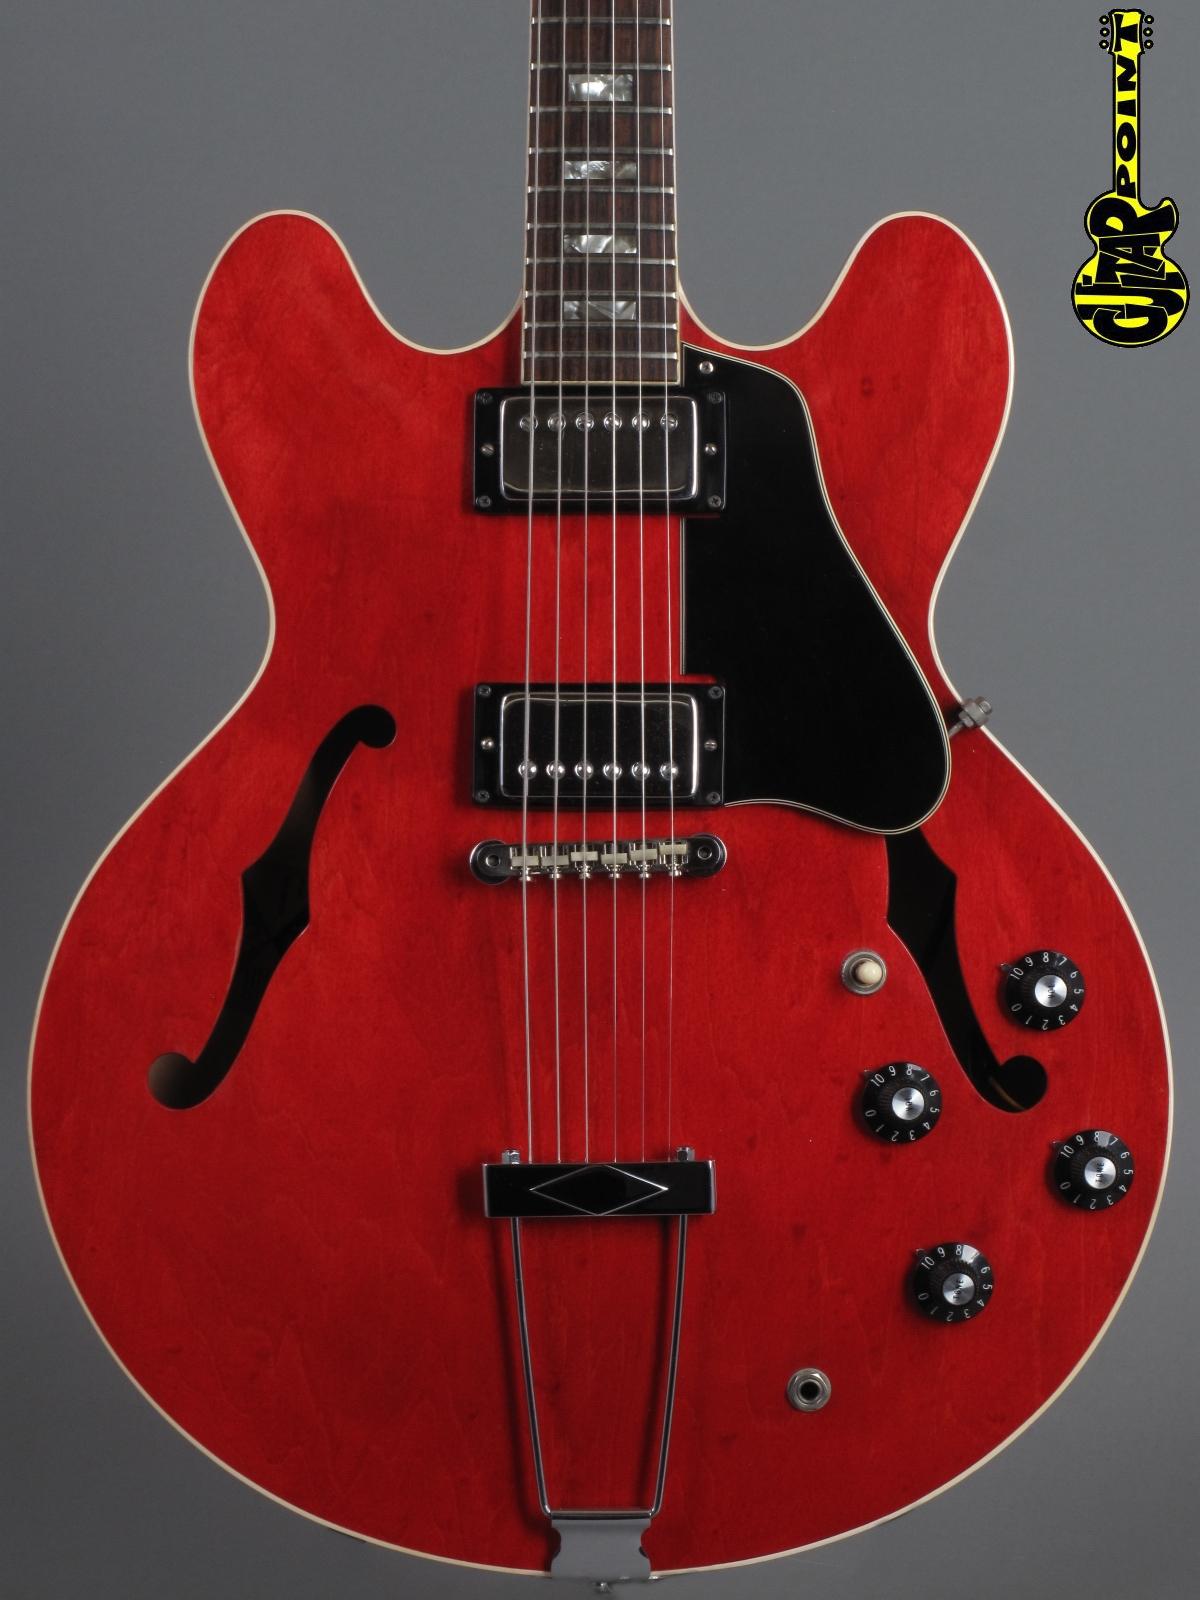 1973 Gibson ES-335 TDC - Cherry